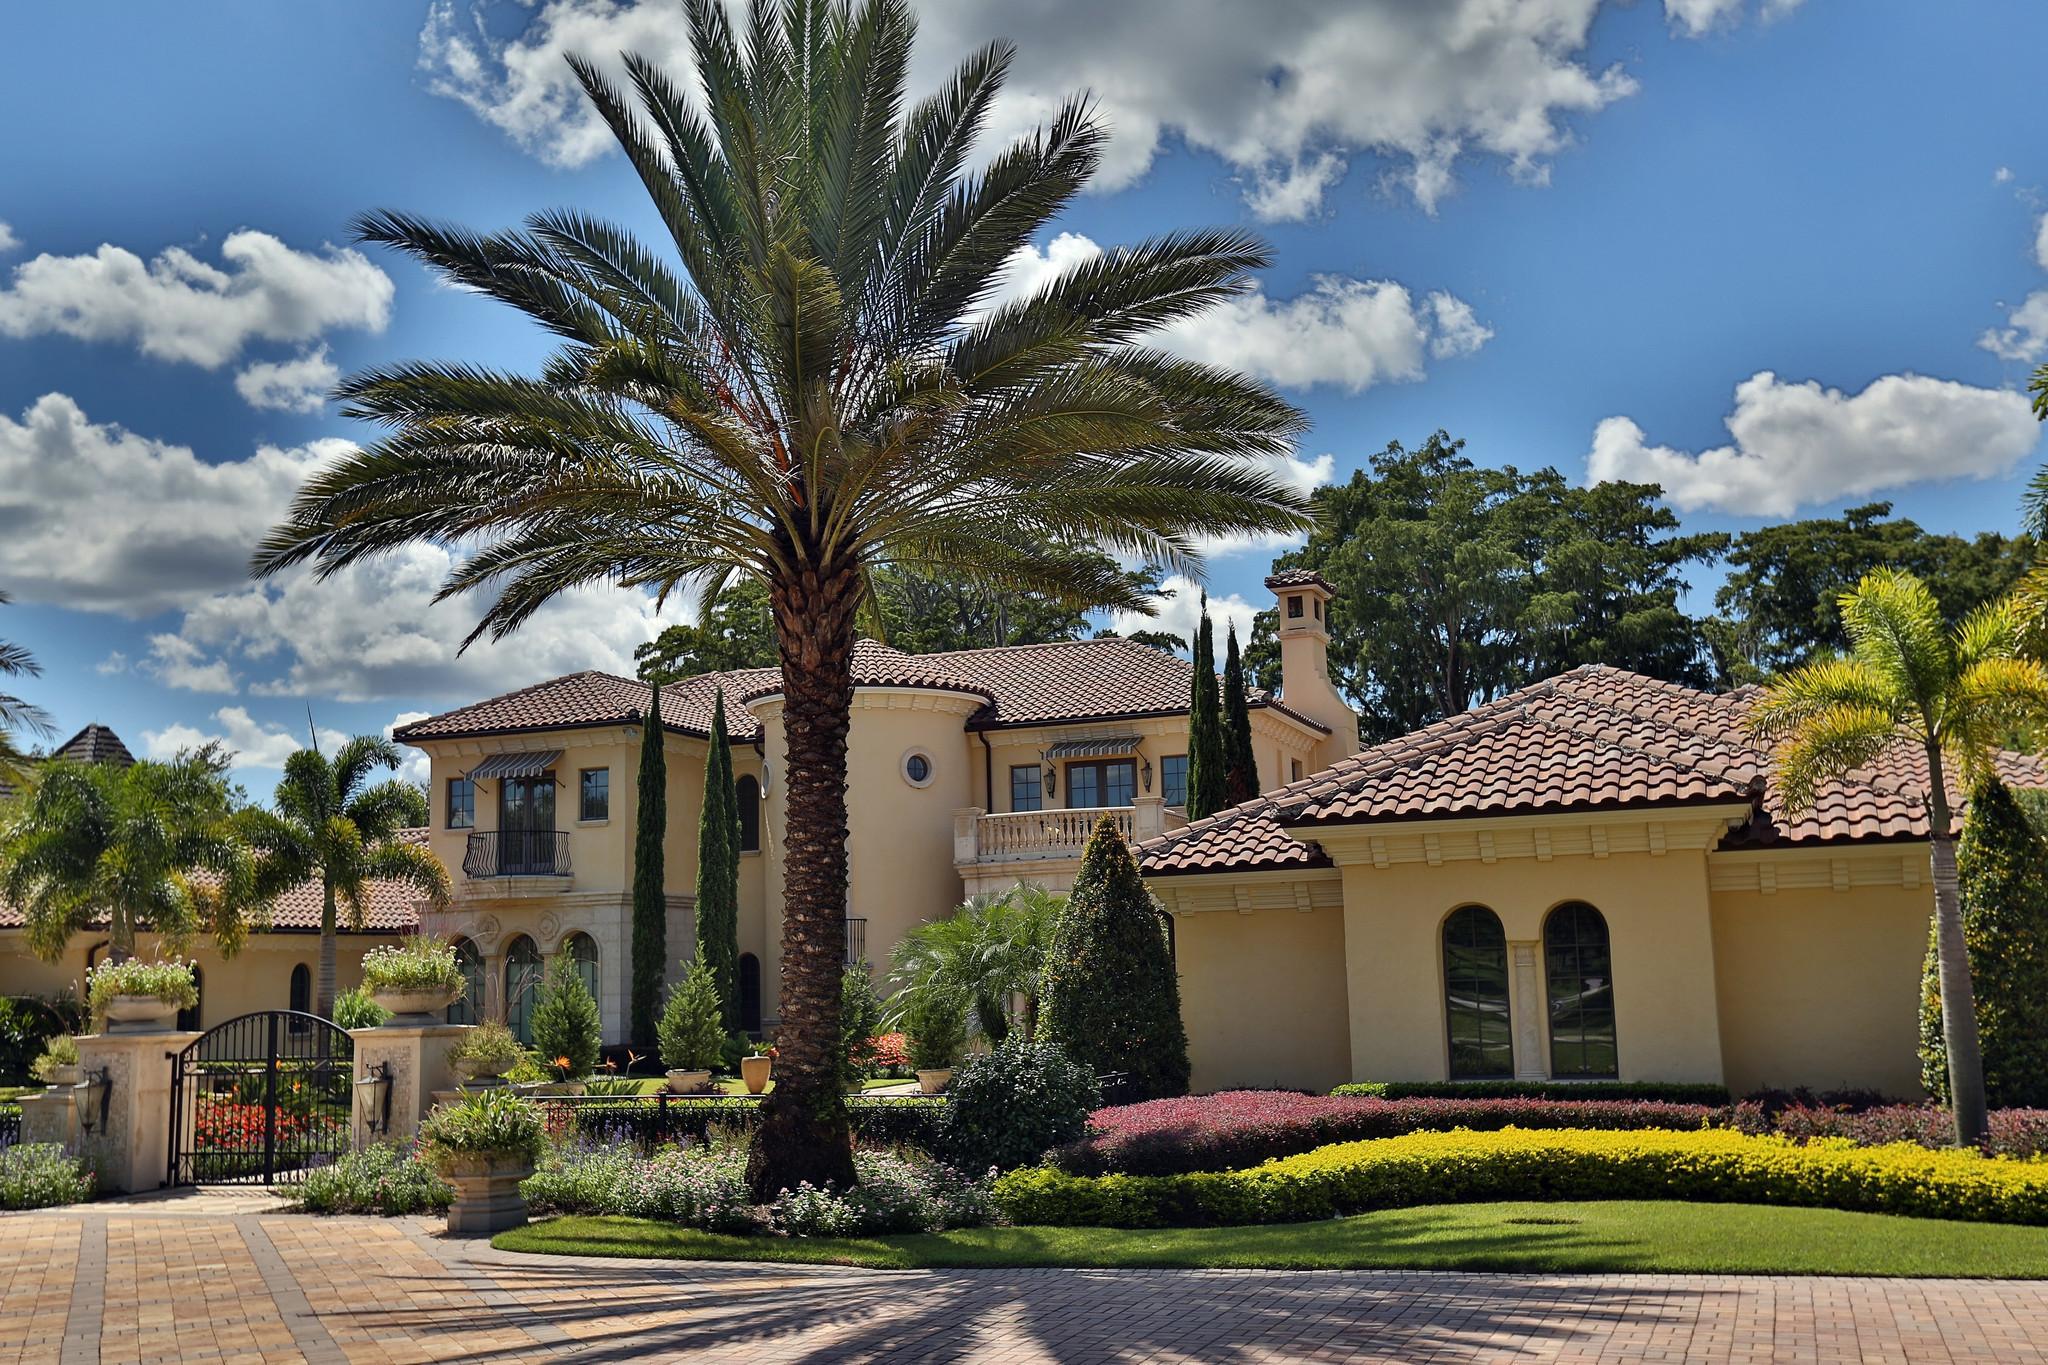 mansions show wealth shifts in orlando orlando sentinel